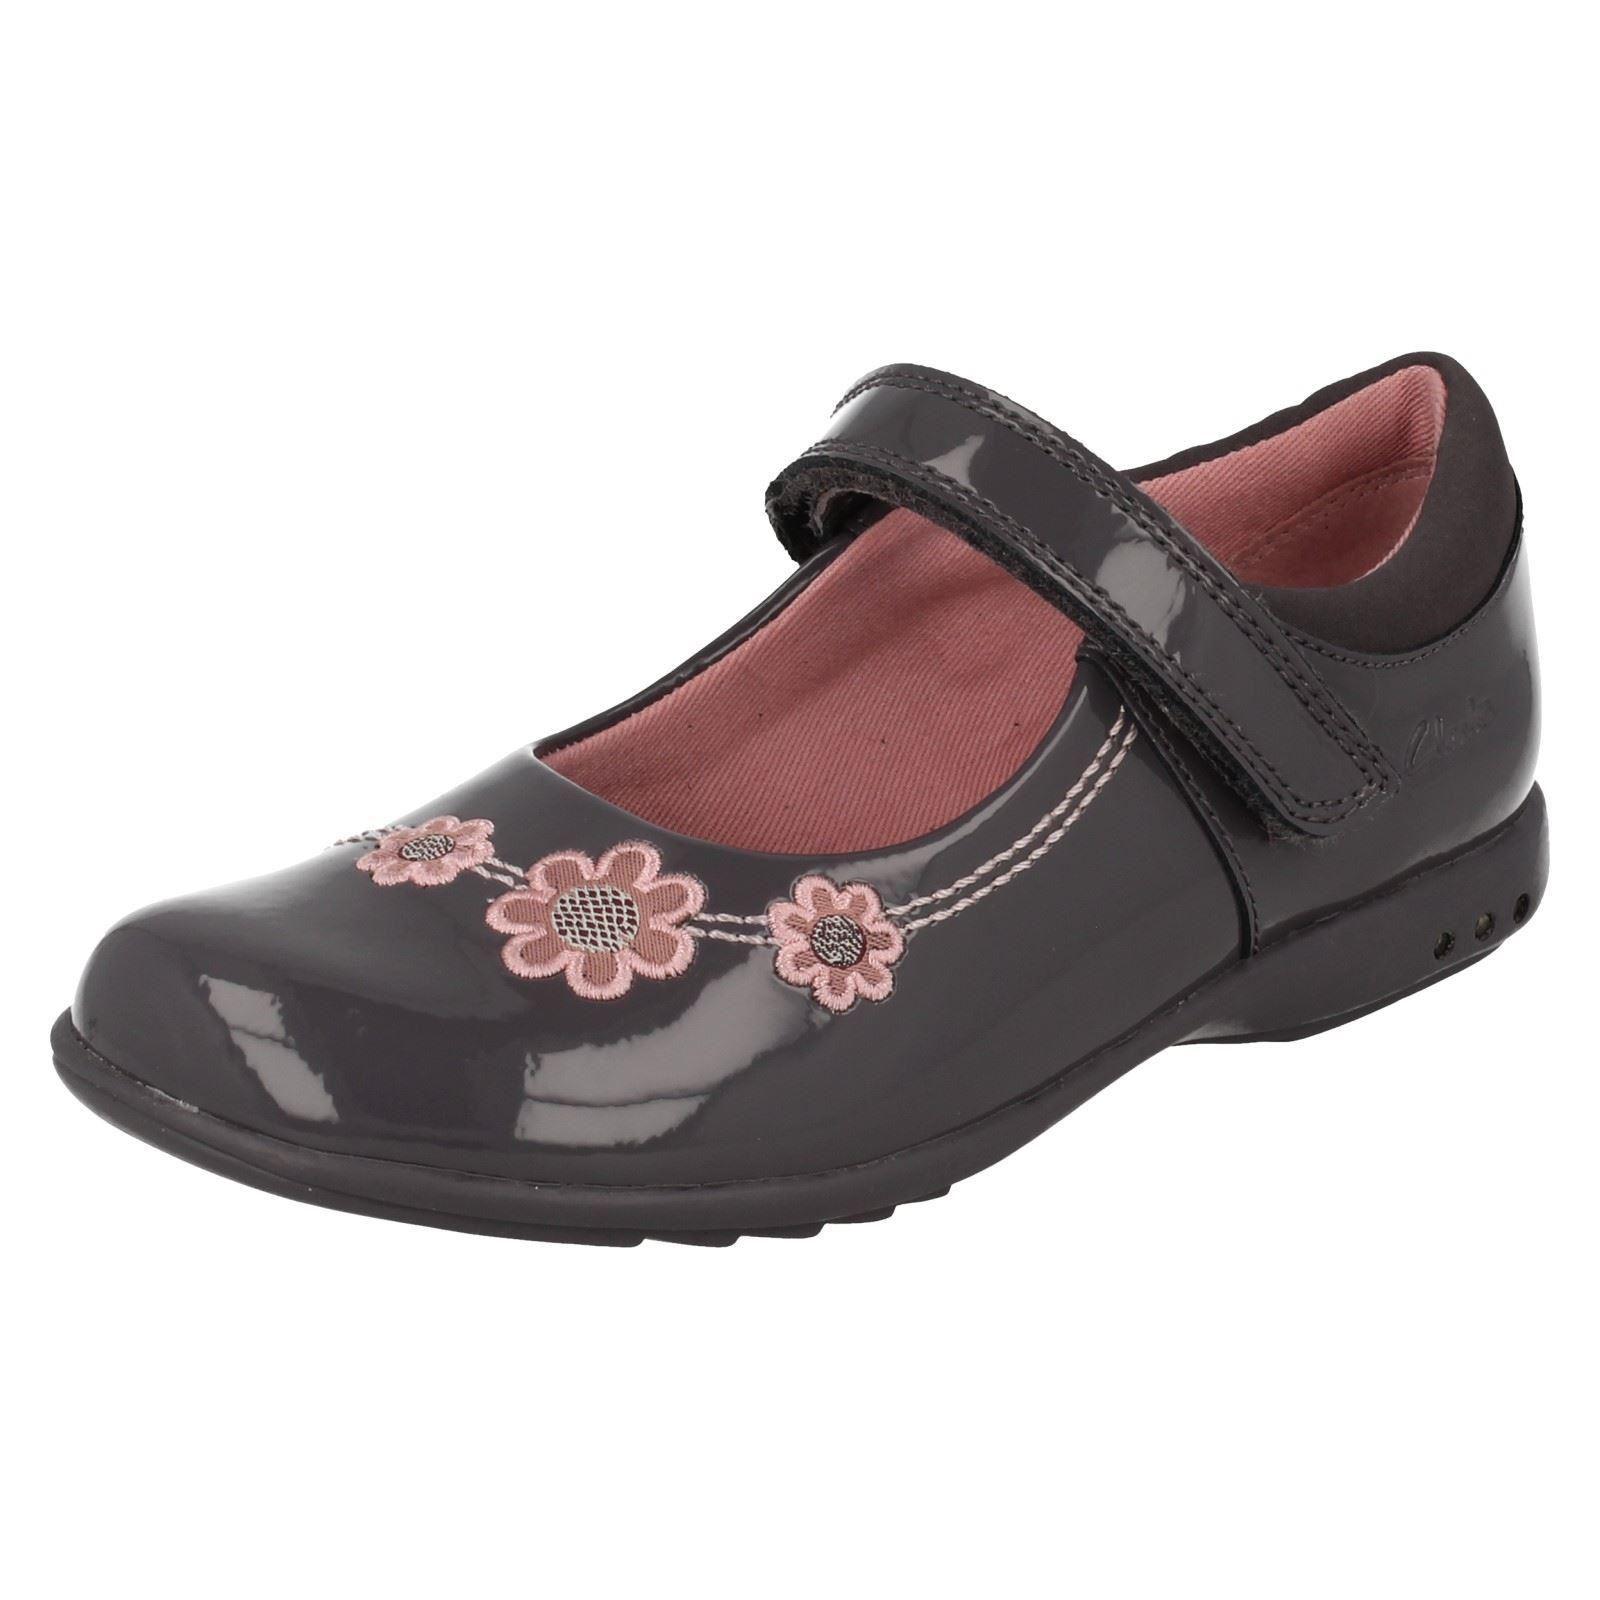 clarks casual wear shoes trixiwhizz ebay